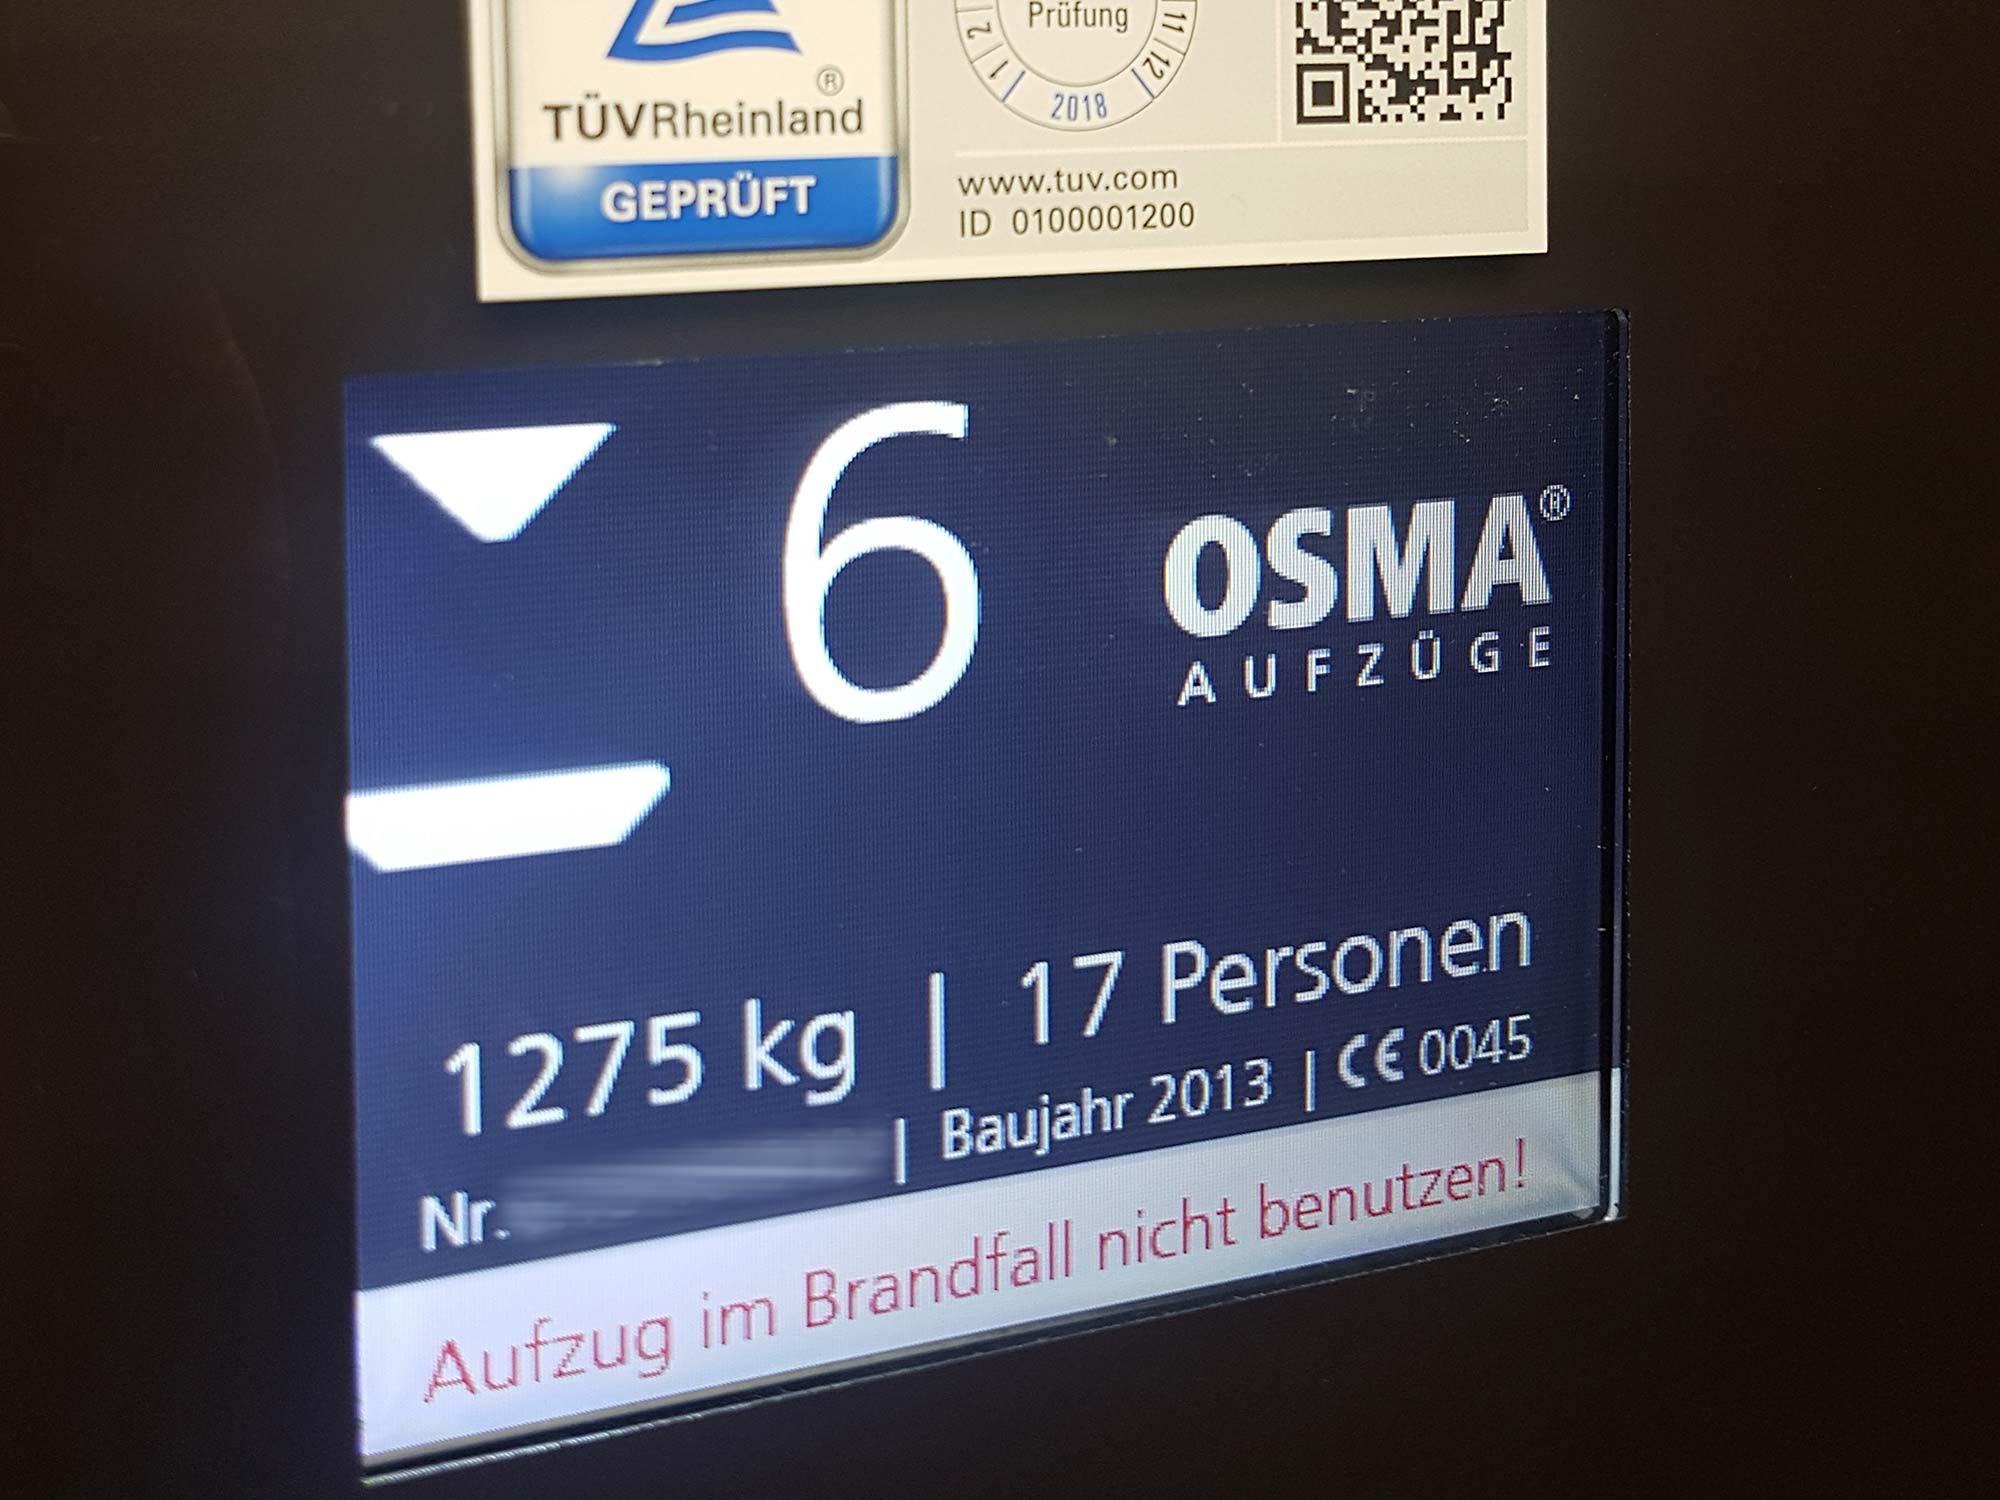 OSMA Aufzüge Frankfurt - Hochhaus Aufzug - TÜV Rheinland